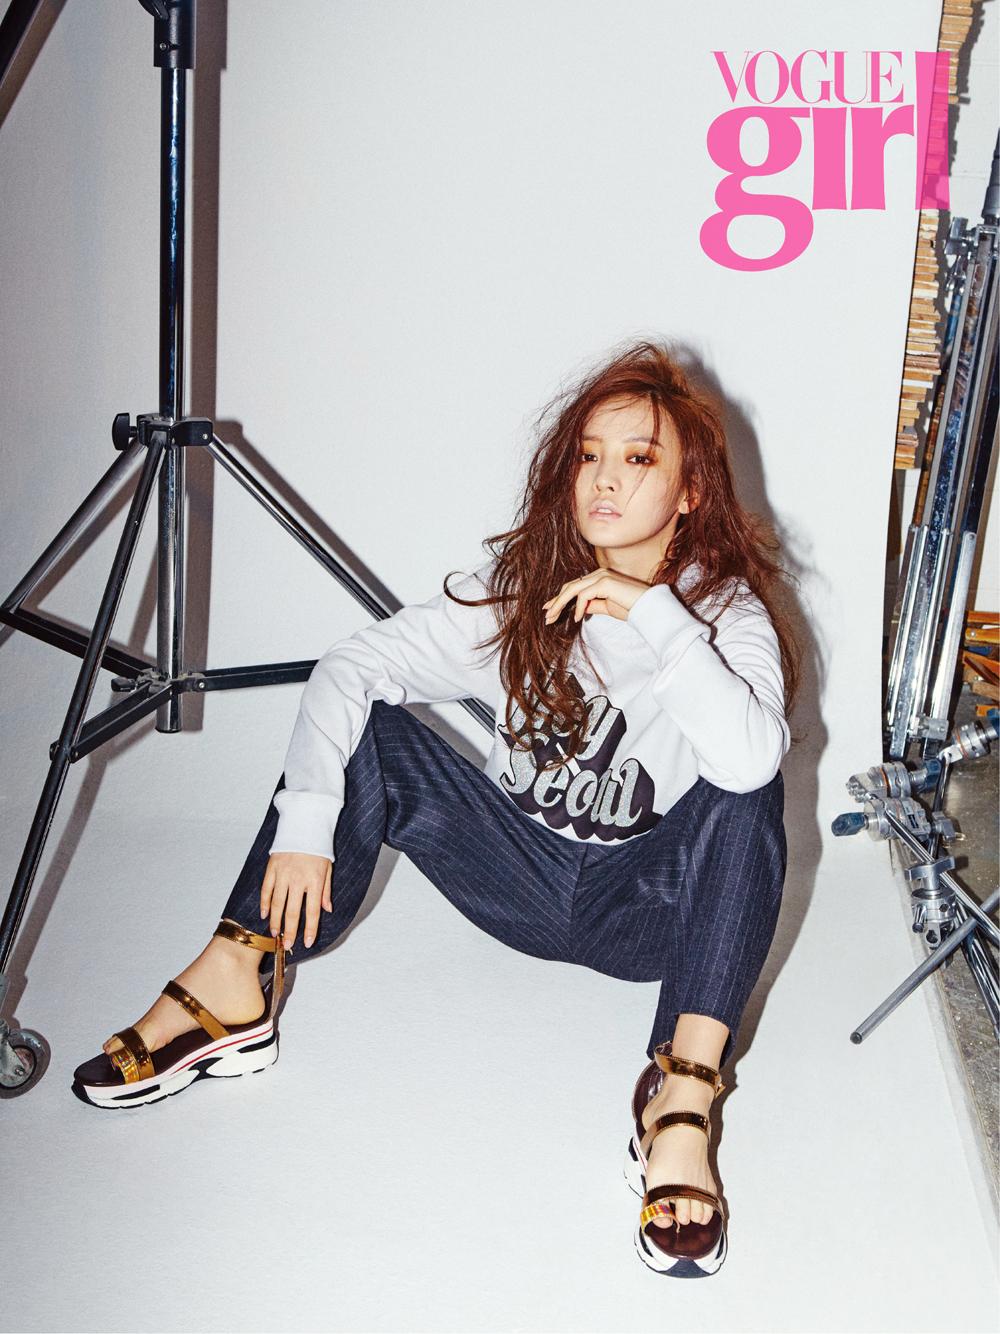 Kara具荷拉演繹帥氣早春時尚 - KSD 韓星網 (畫報) | Girl korea, Girls magazine, Kpop girls